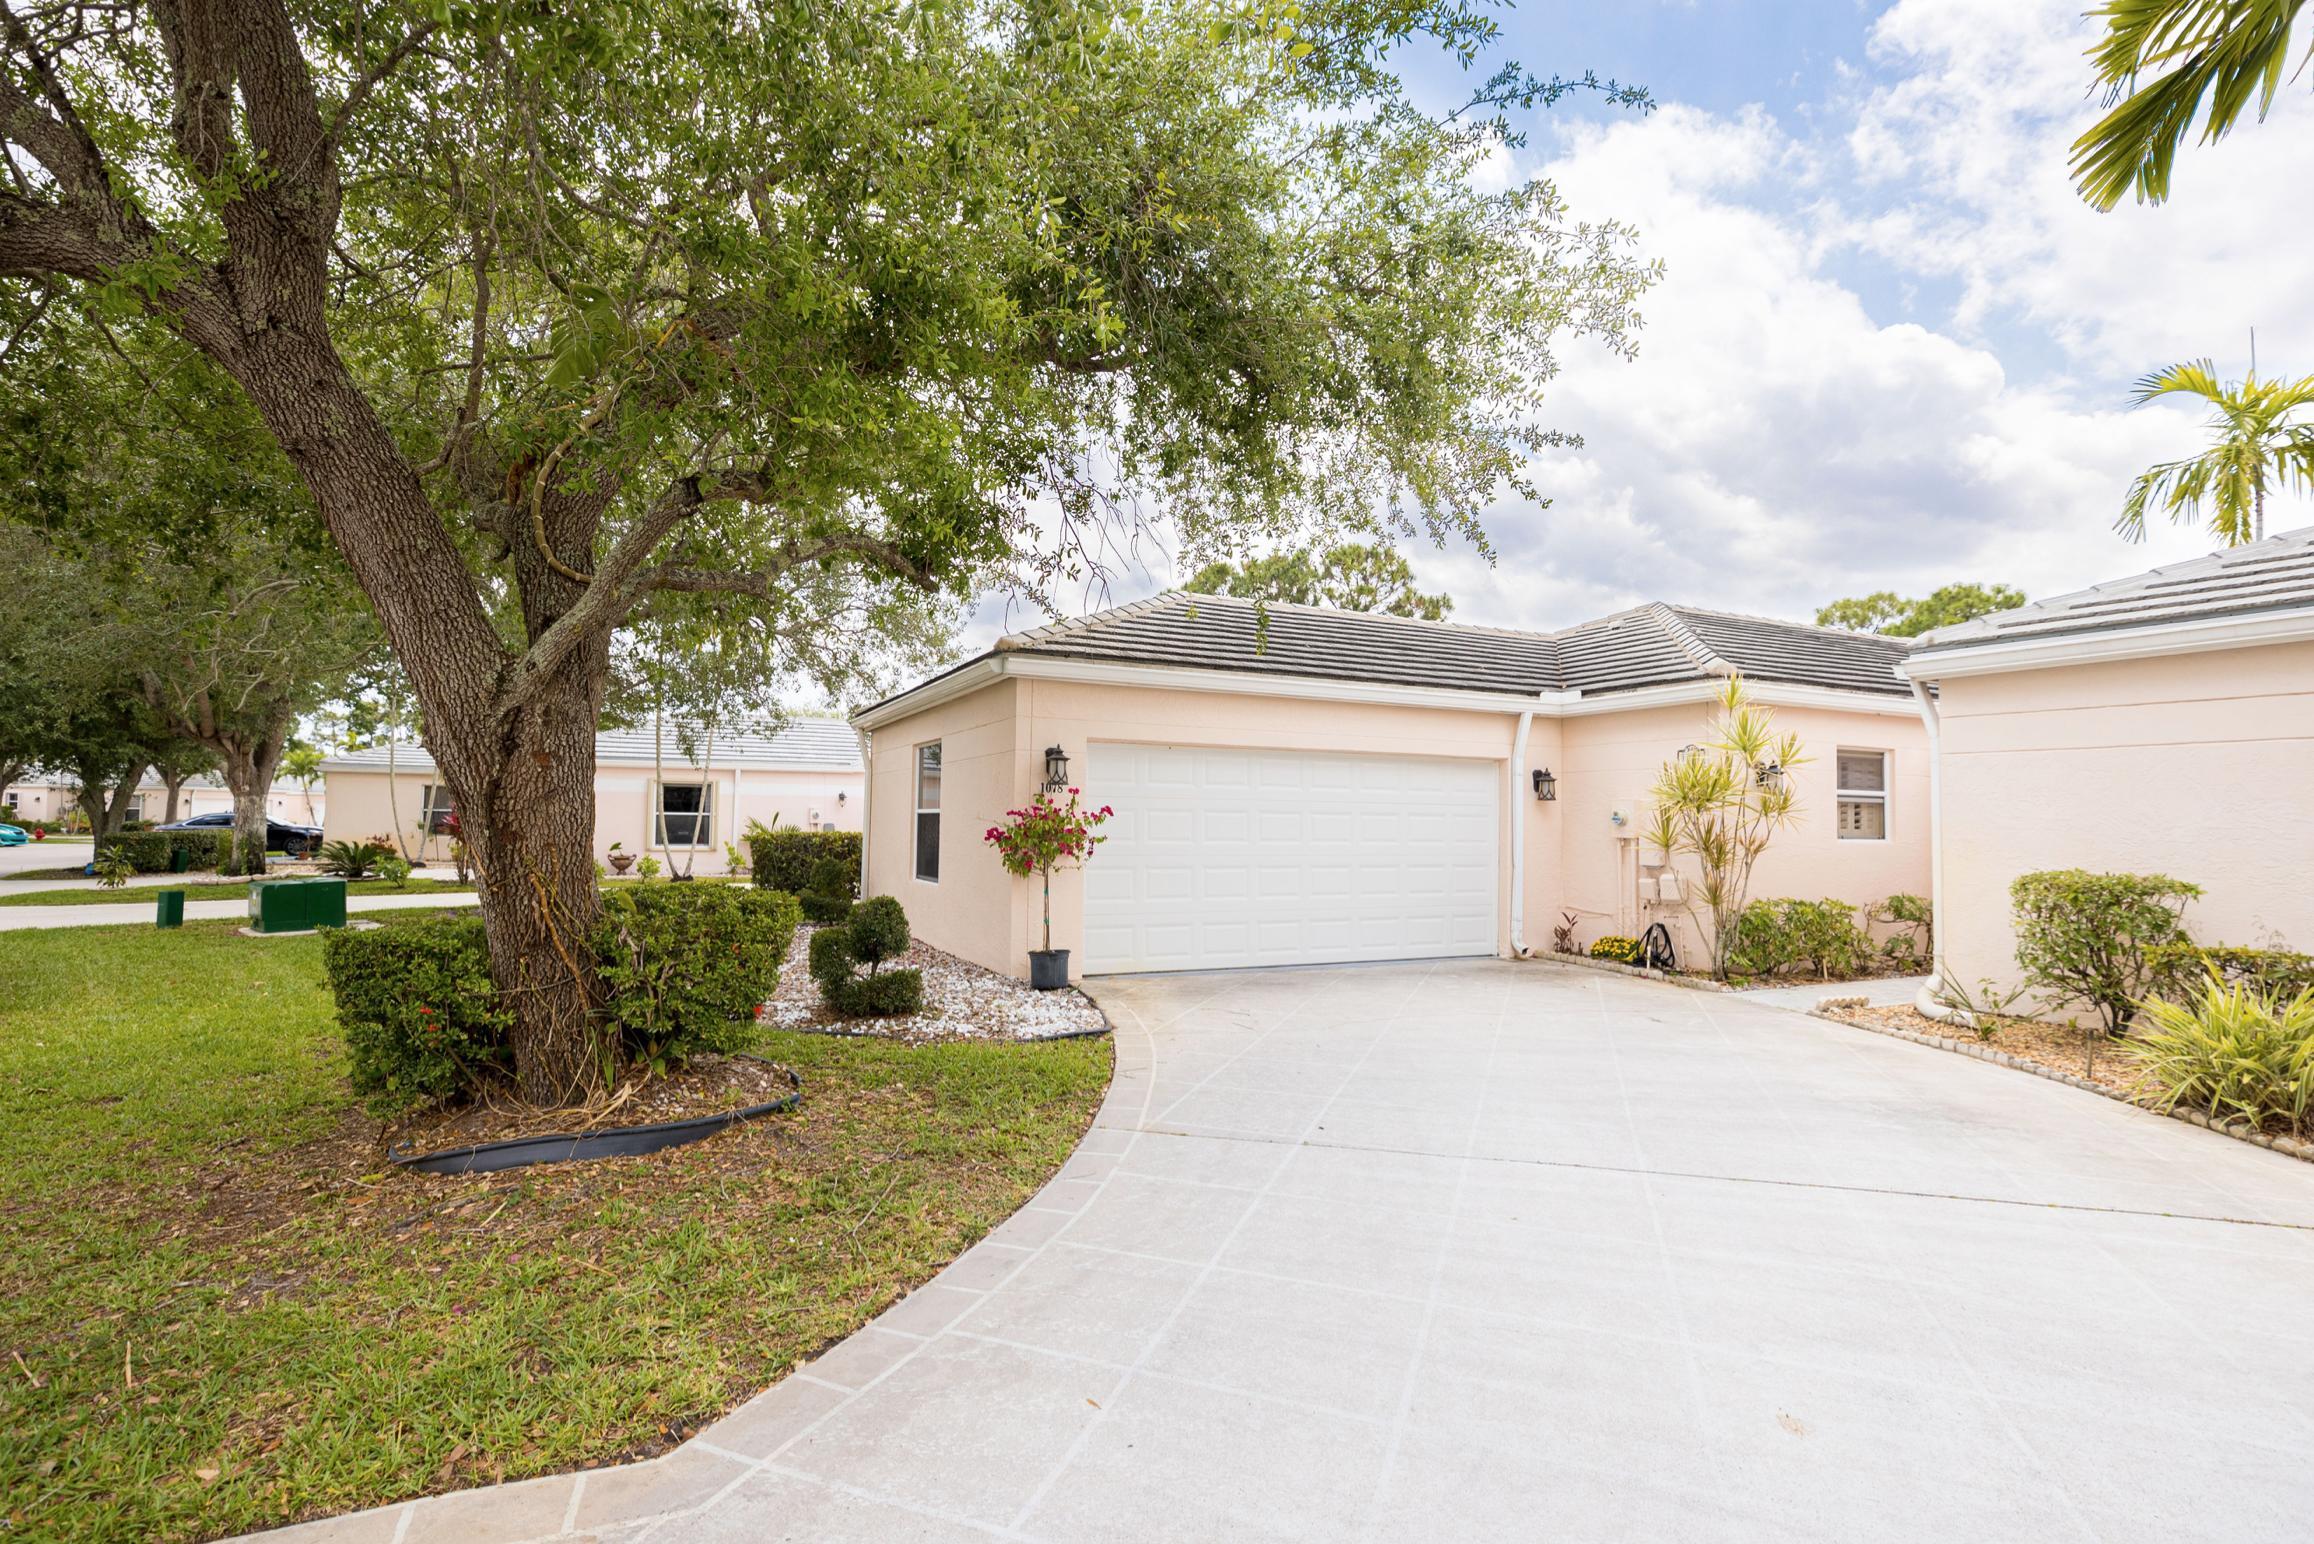 1078 Island Manor Drive - 33413 - FL - Greenacres